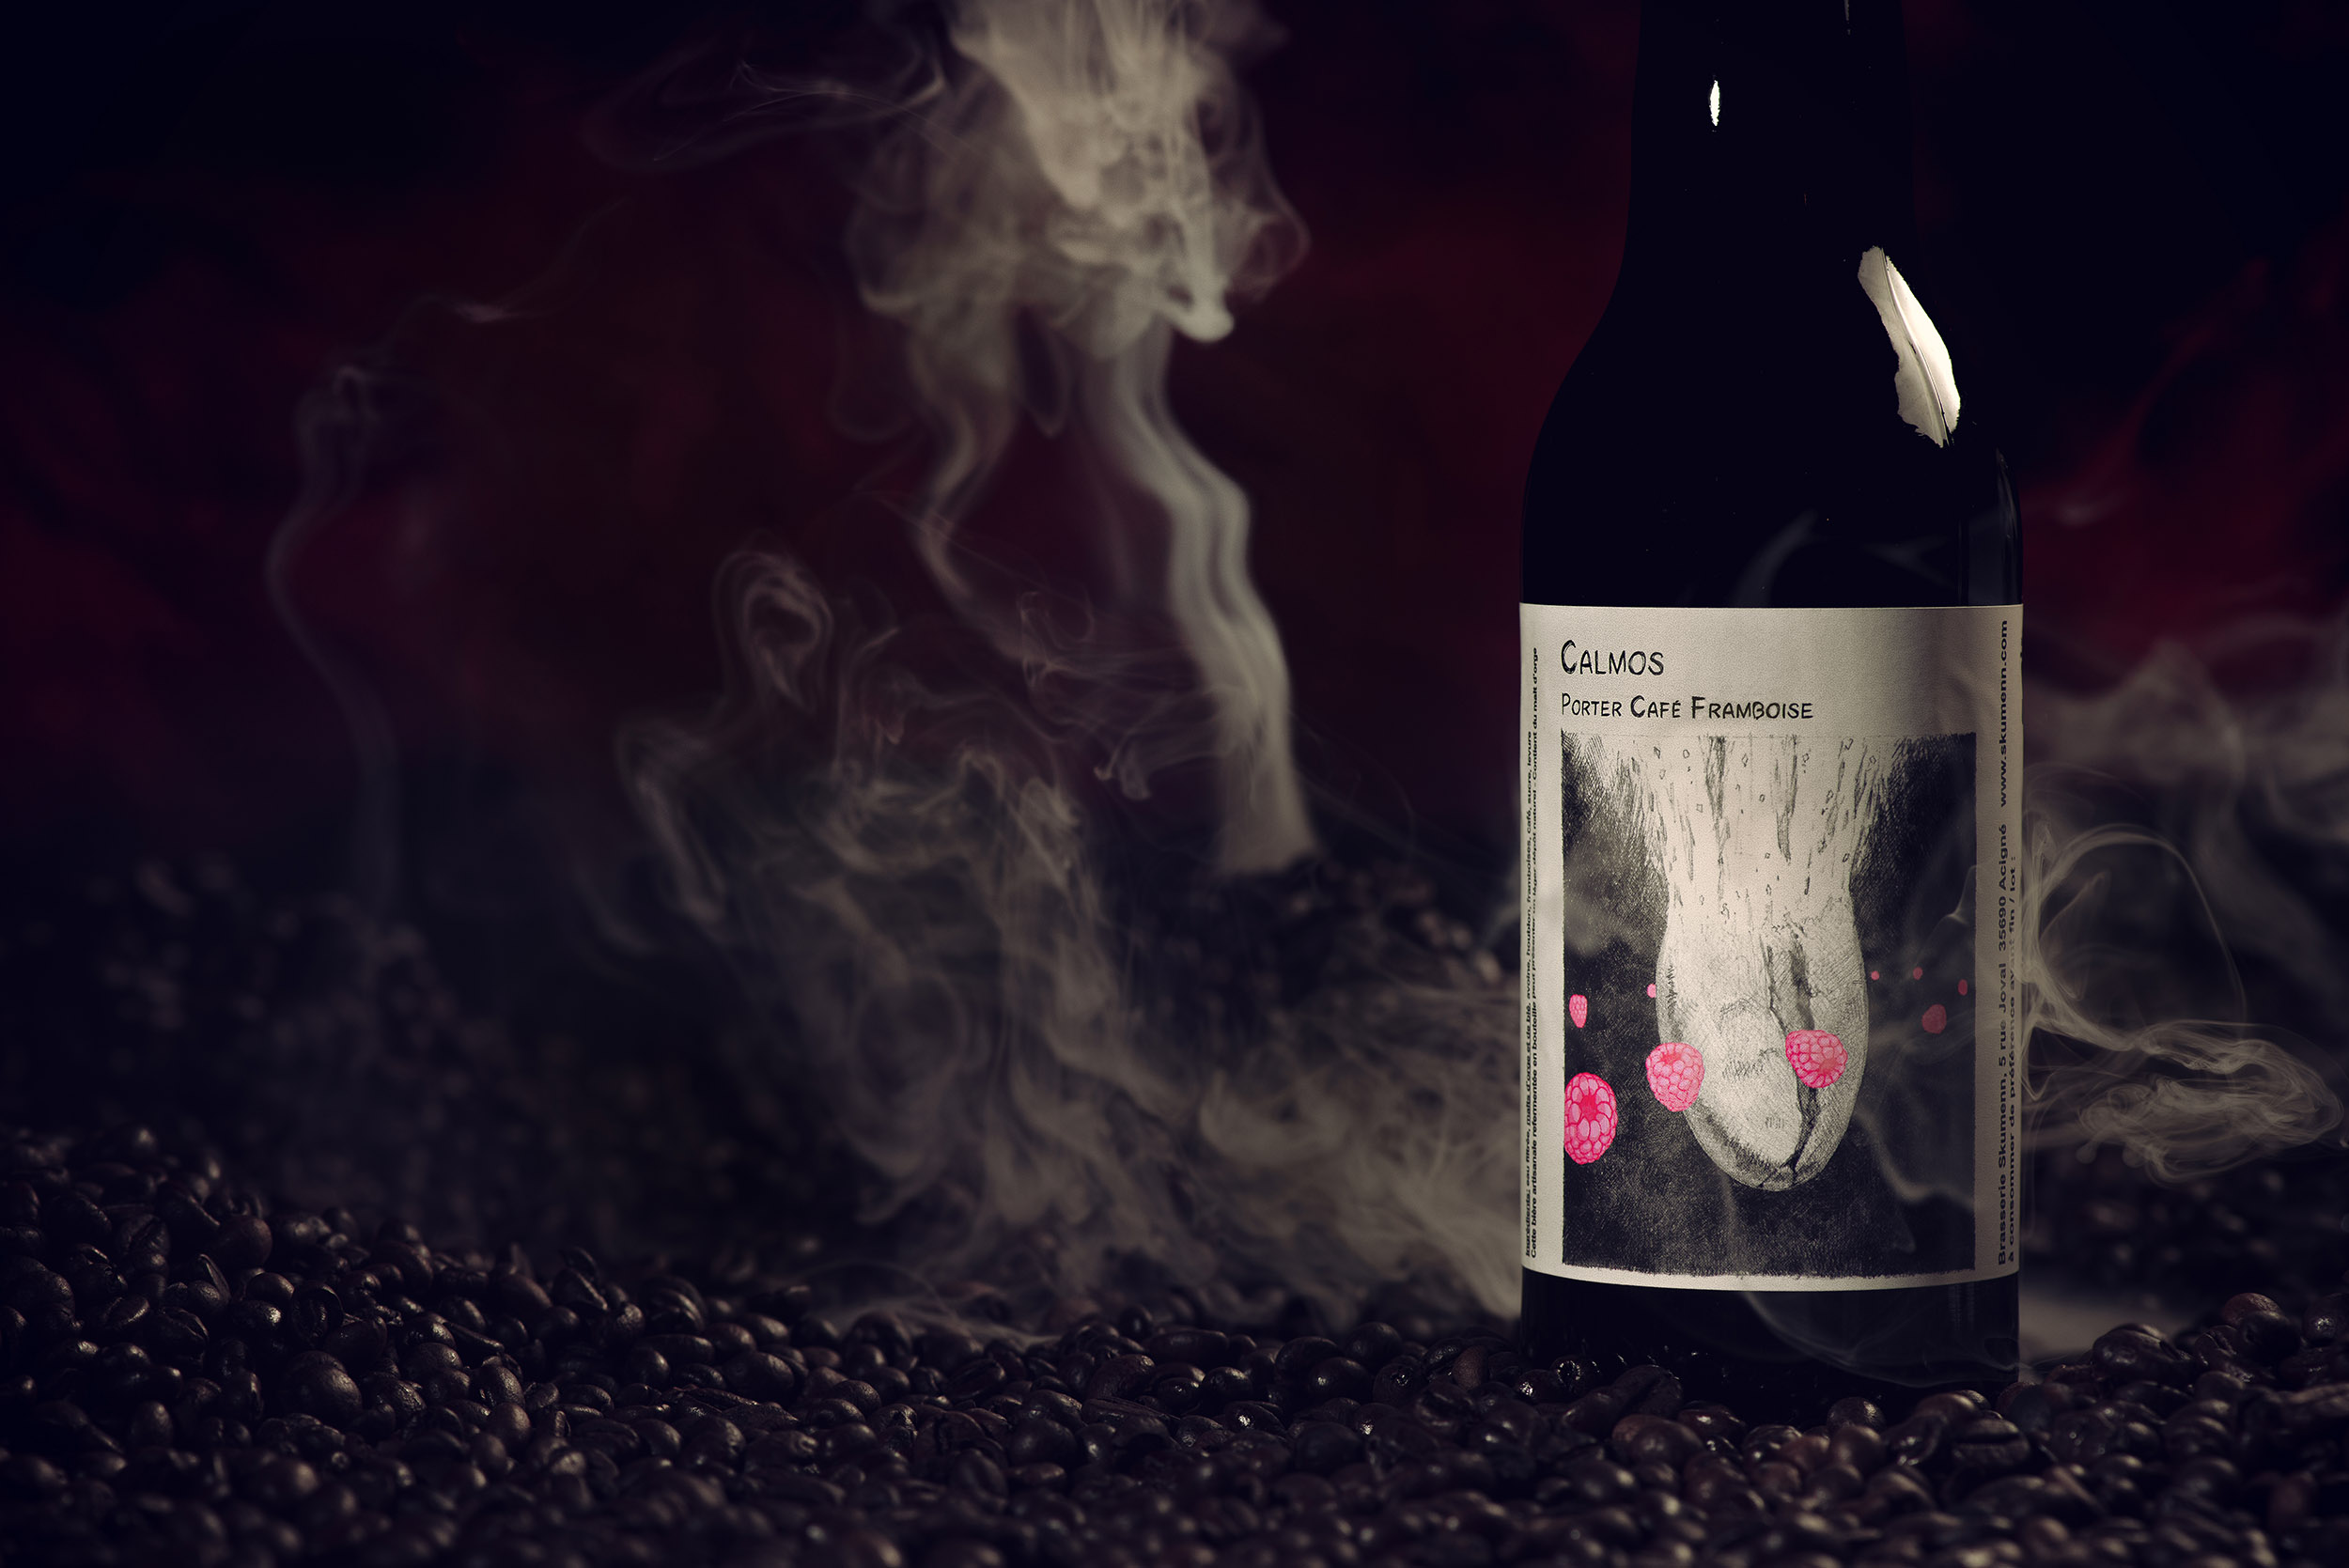 «Calmos» Porter café framboise, une bière de collab'